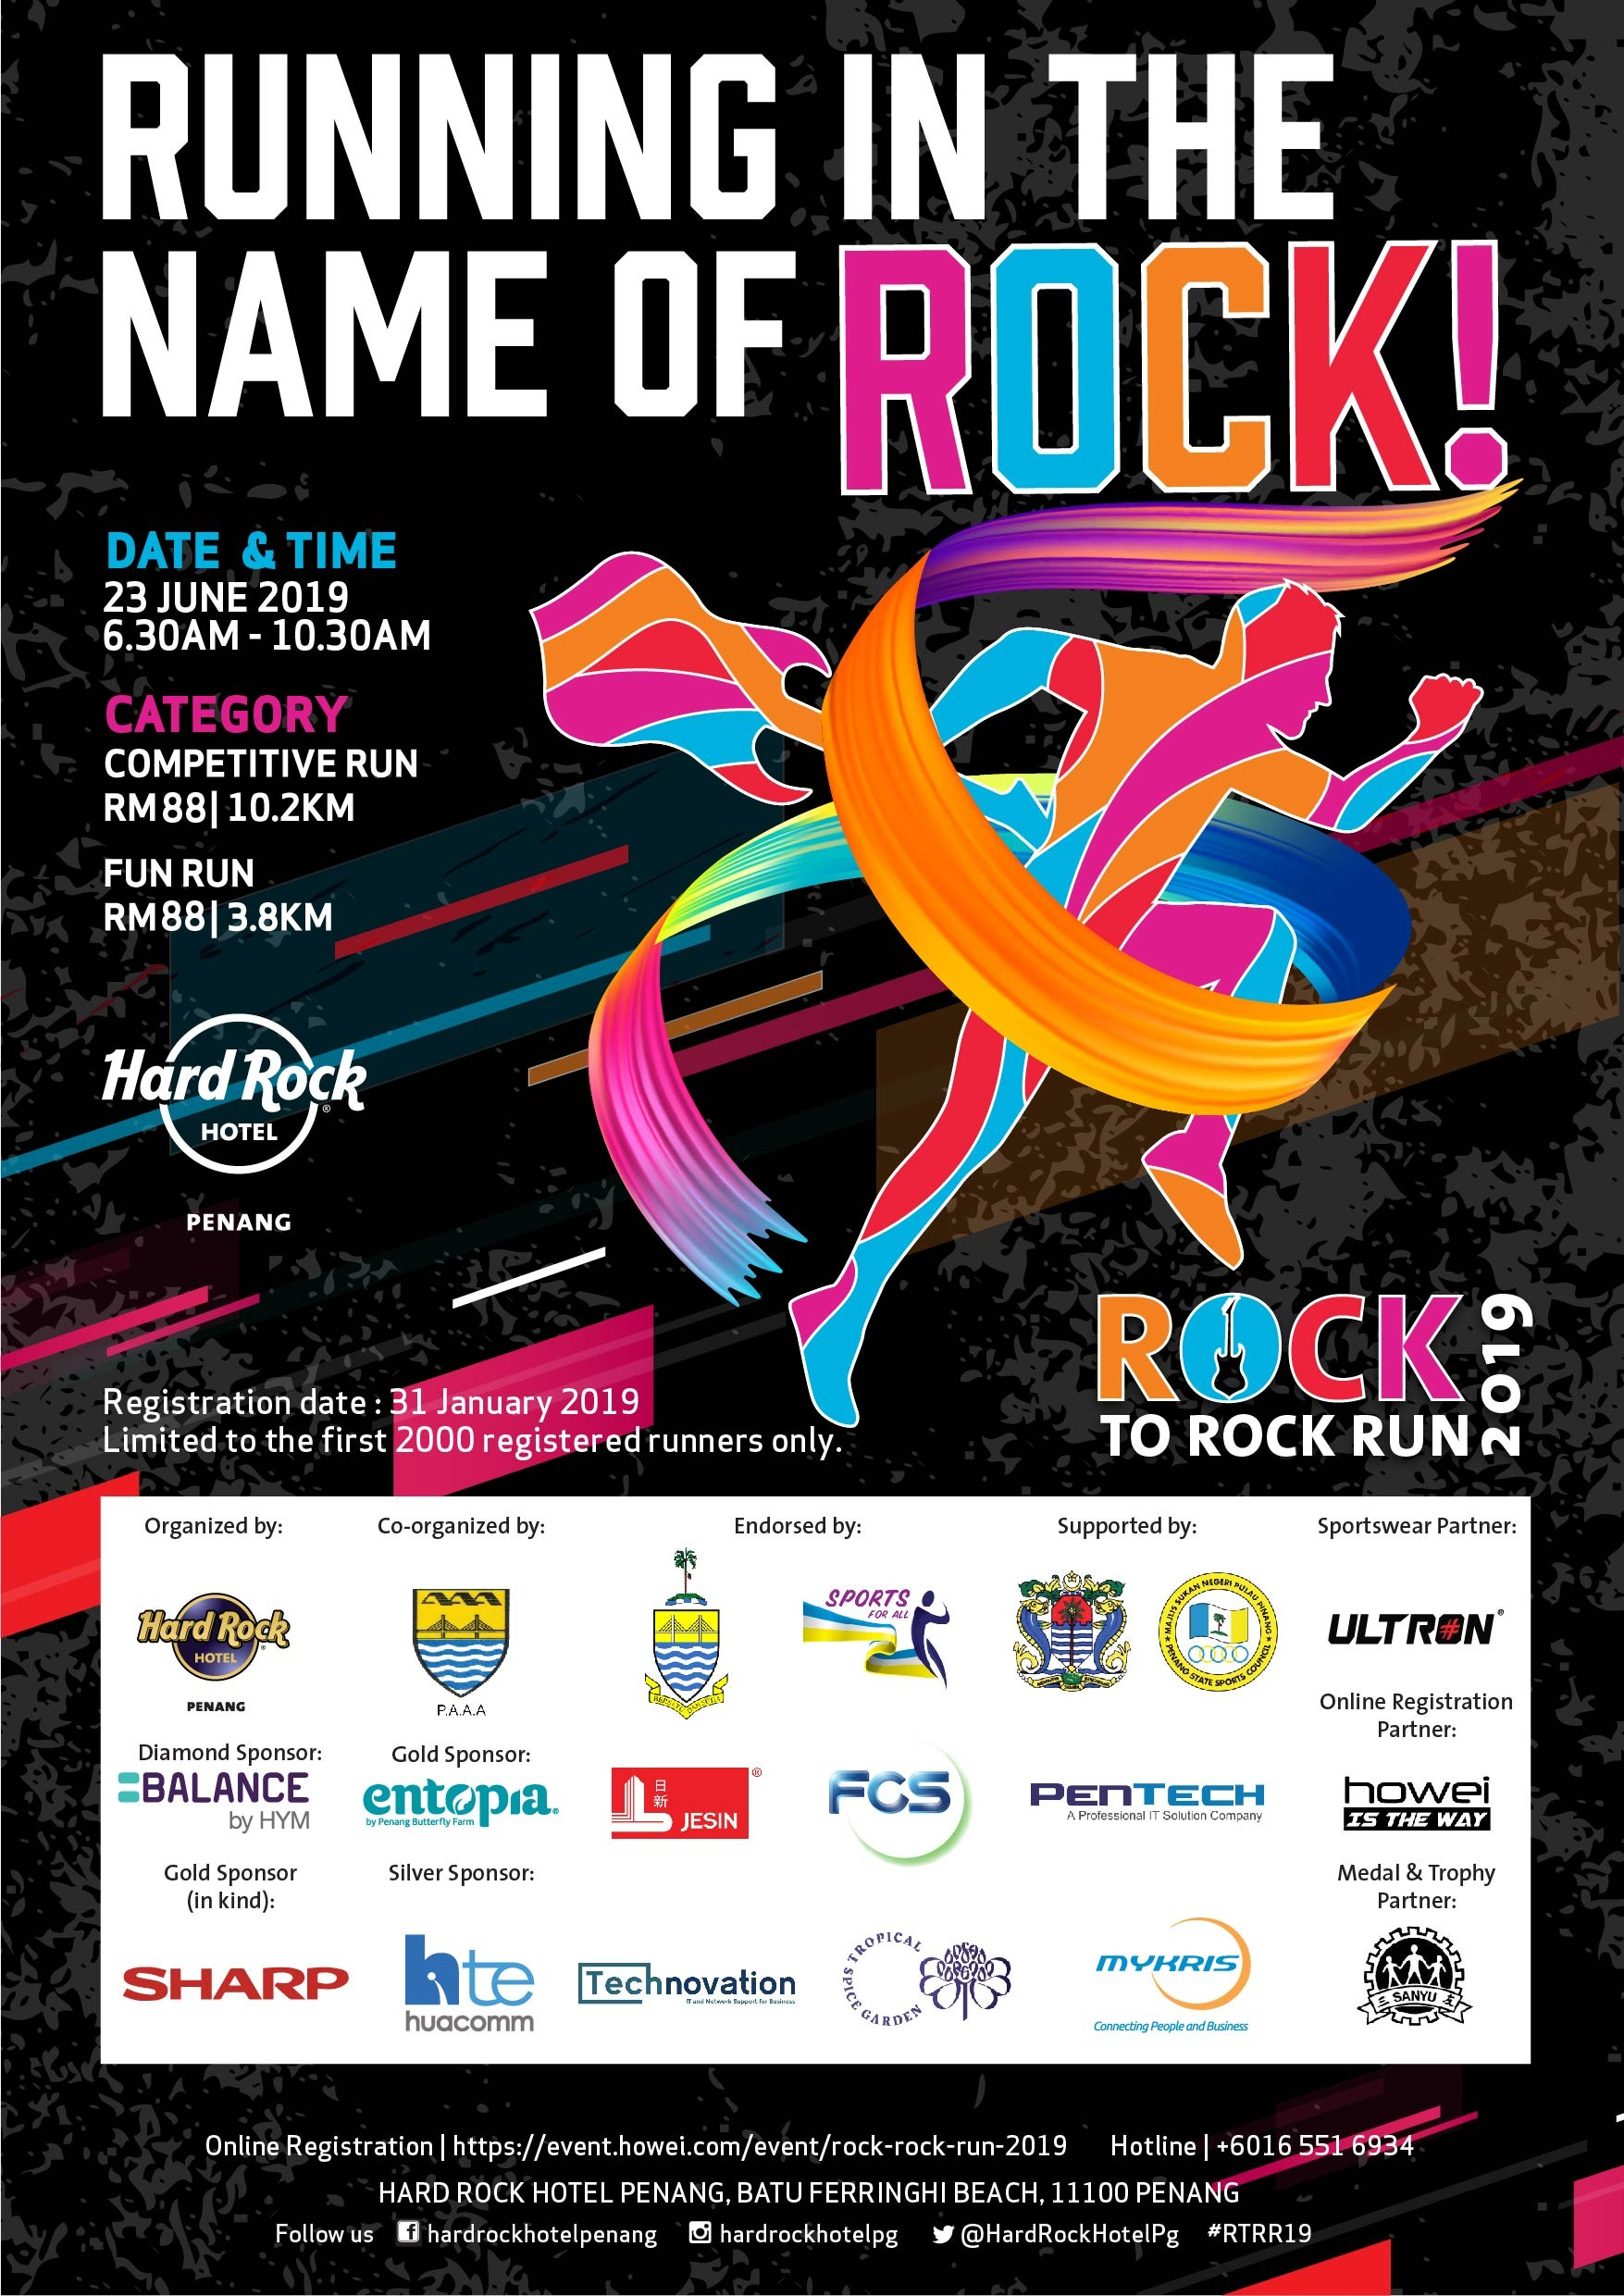 Rock To Rock Run 2019 | Howei Online Event Registration